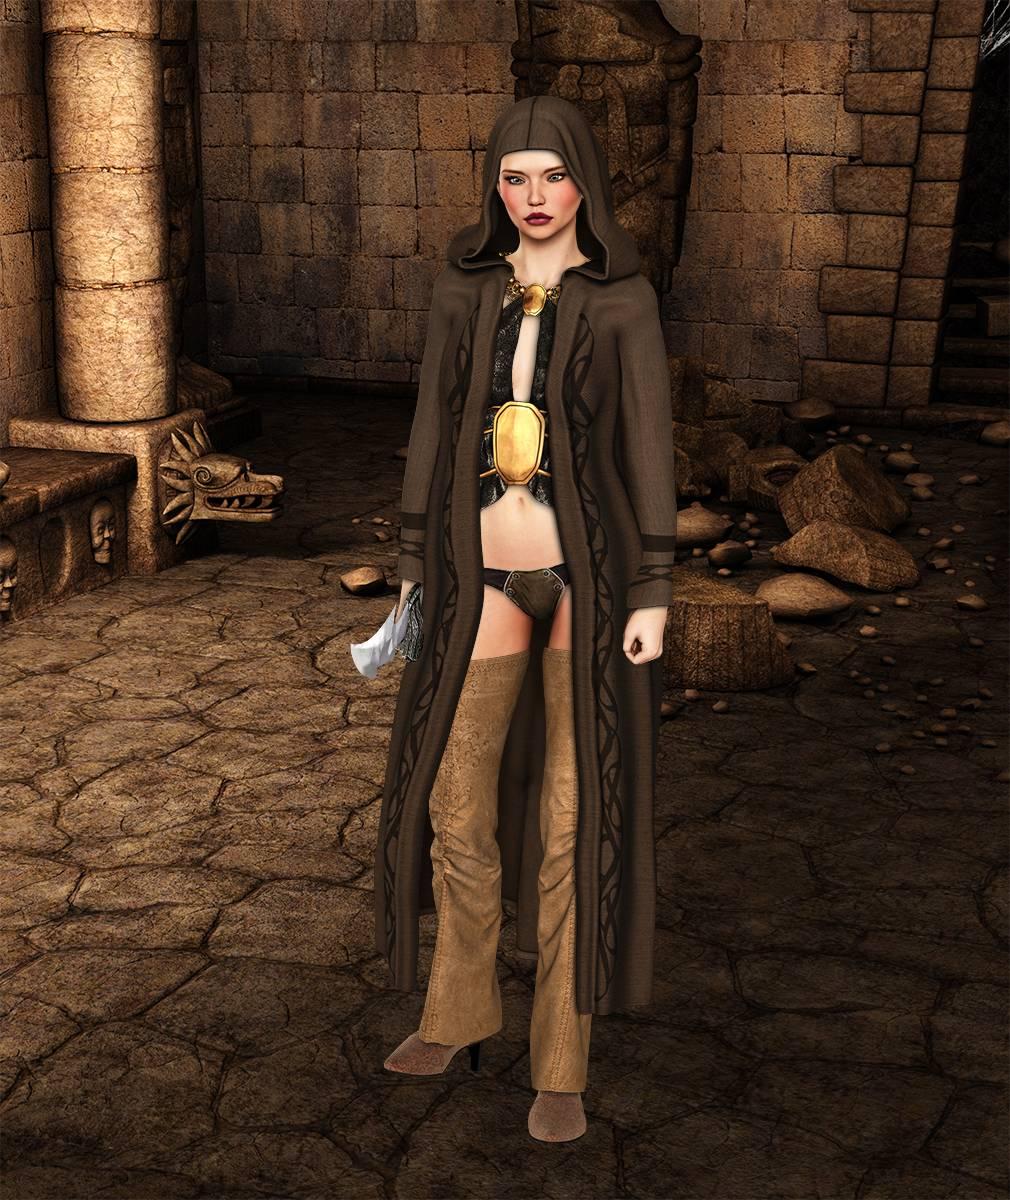 ePic Character Generator Season 2 Female Adventurer 1 Screenshot 14